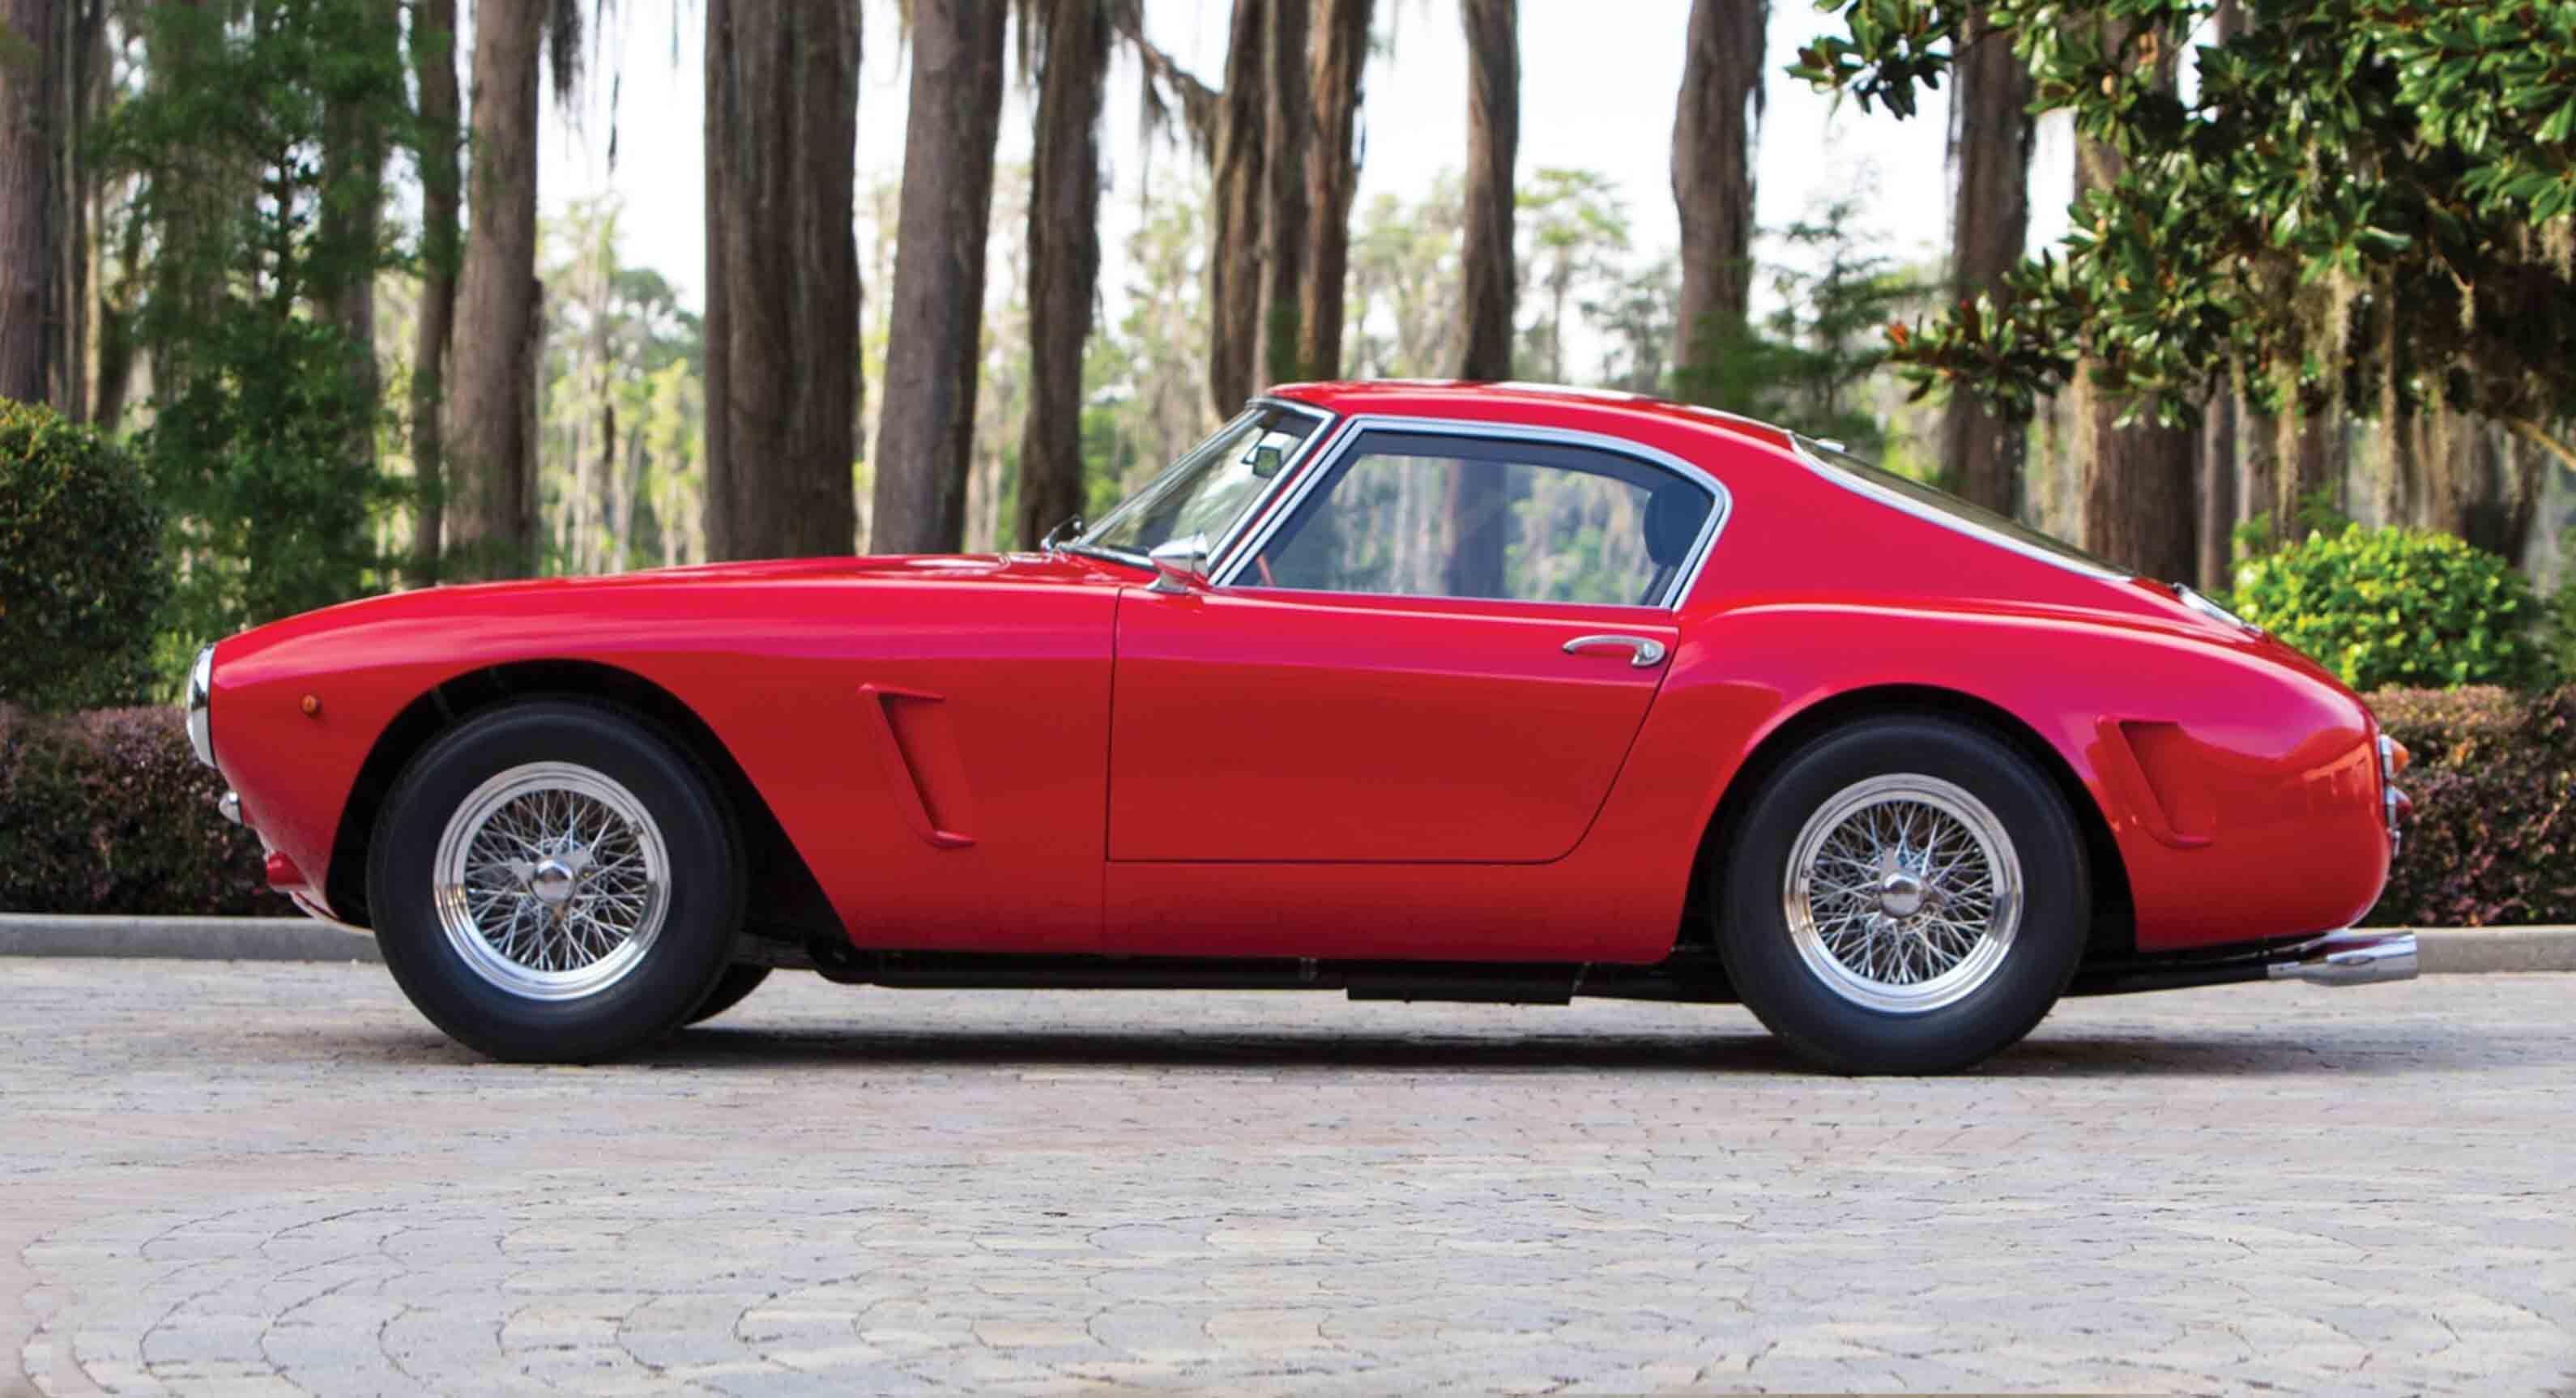 Classic Car Find Of The Week: 1960 Ferrari 250 GT SWB Berlinetta